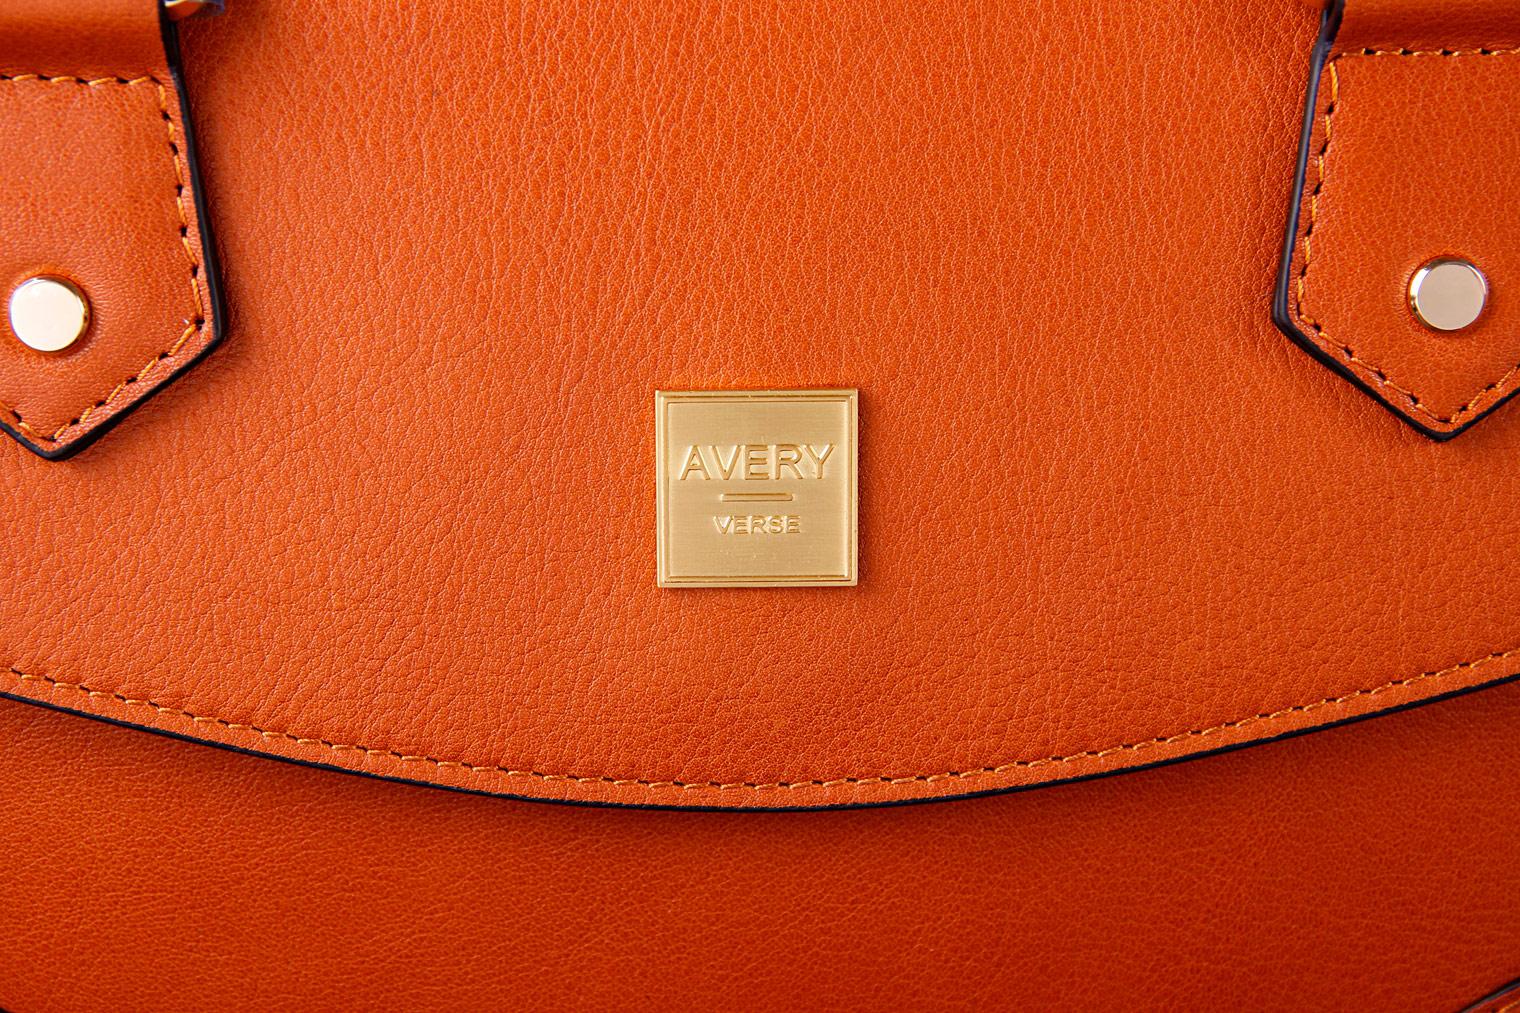 Avery Verse Luxury Handbags